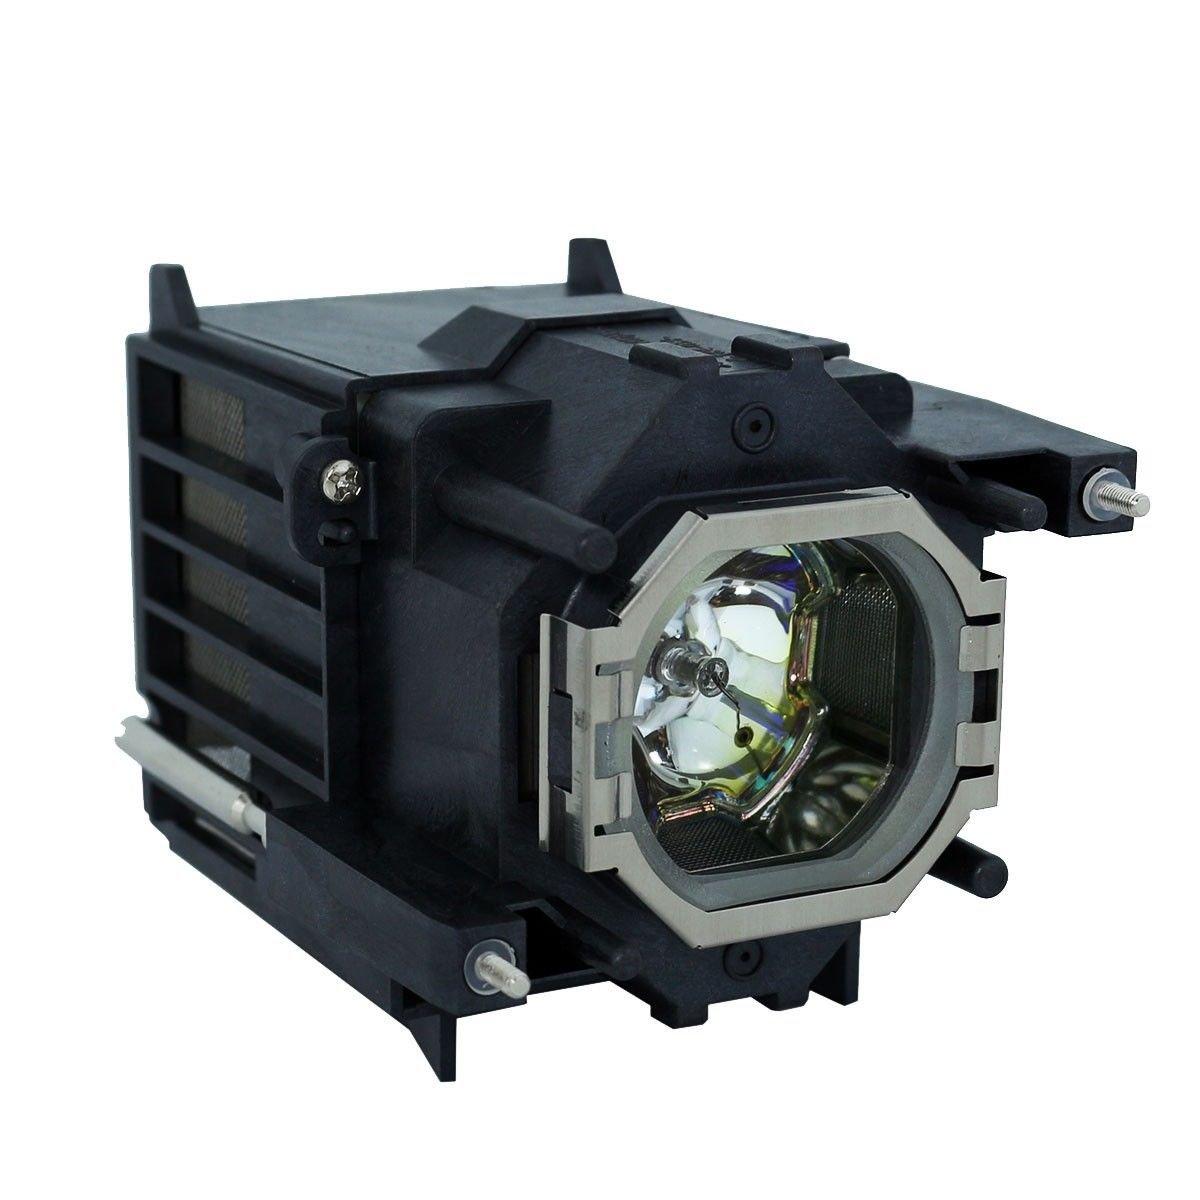 Supermait LMP-F331 プロジェクター交換用ランプ 汎用 150日間安心保証つき VPL-FX37 / VPL-FH35 / VPL-FH36 対応   B078MJT5Q7